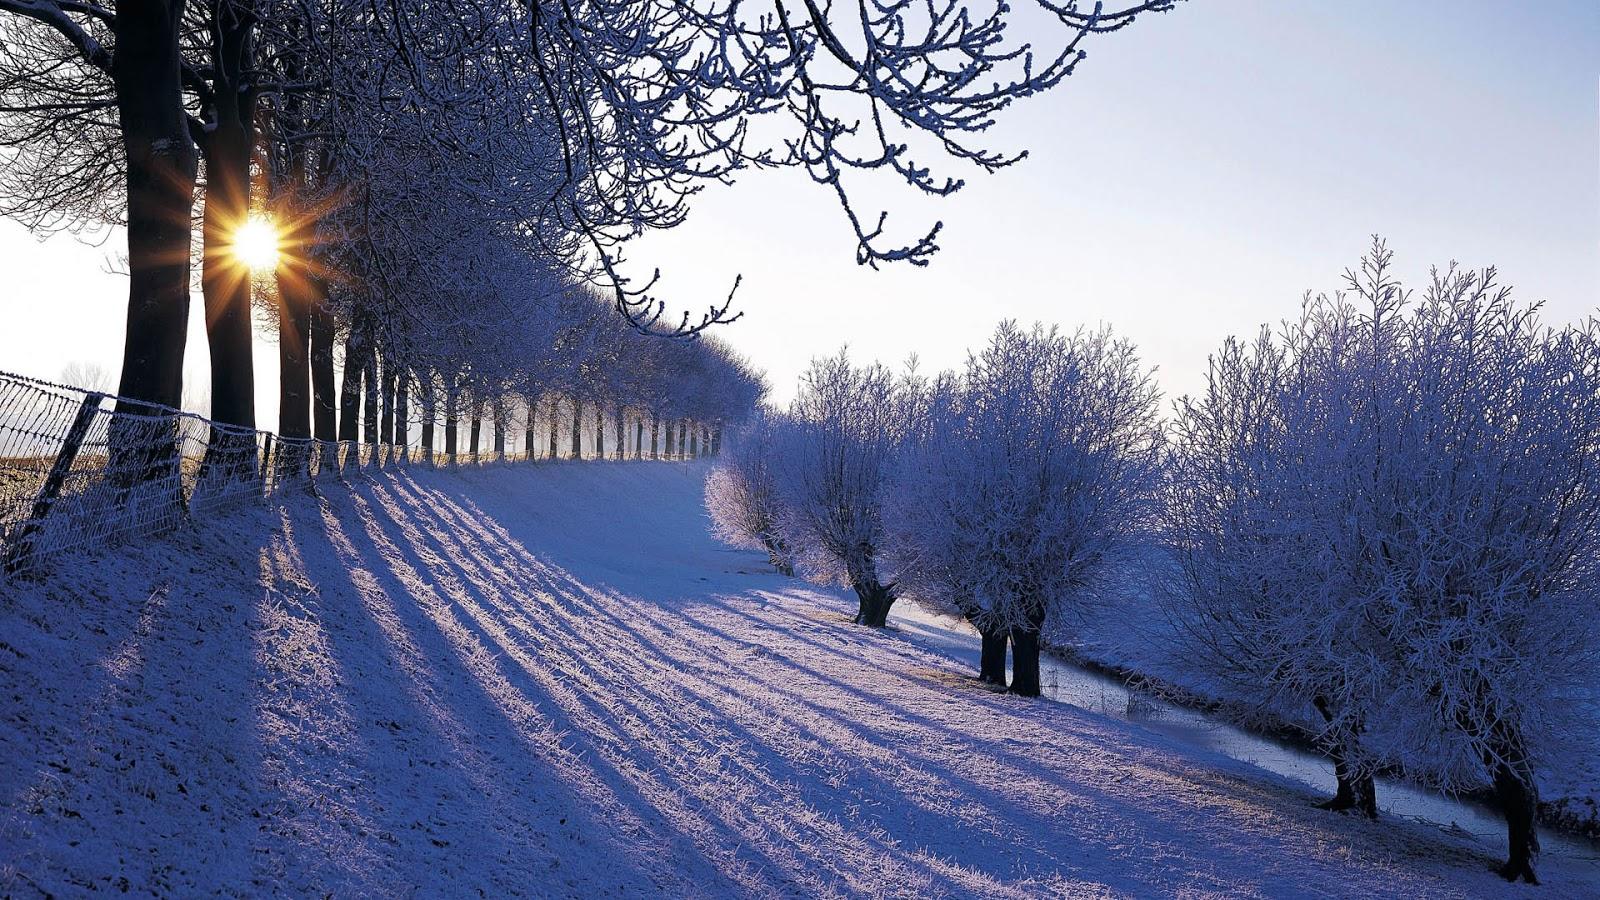 scenery winter wallpaper winter snowfall beautiful wallpaper beauty of 1600x900